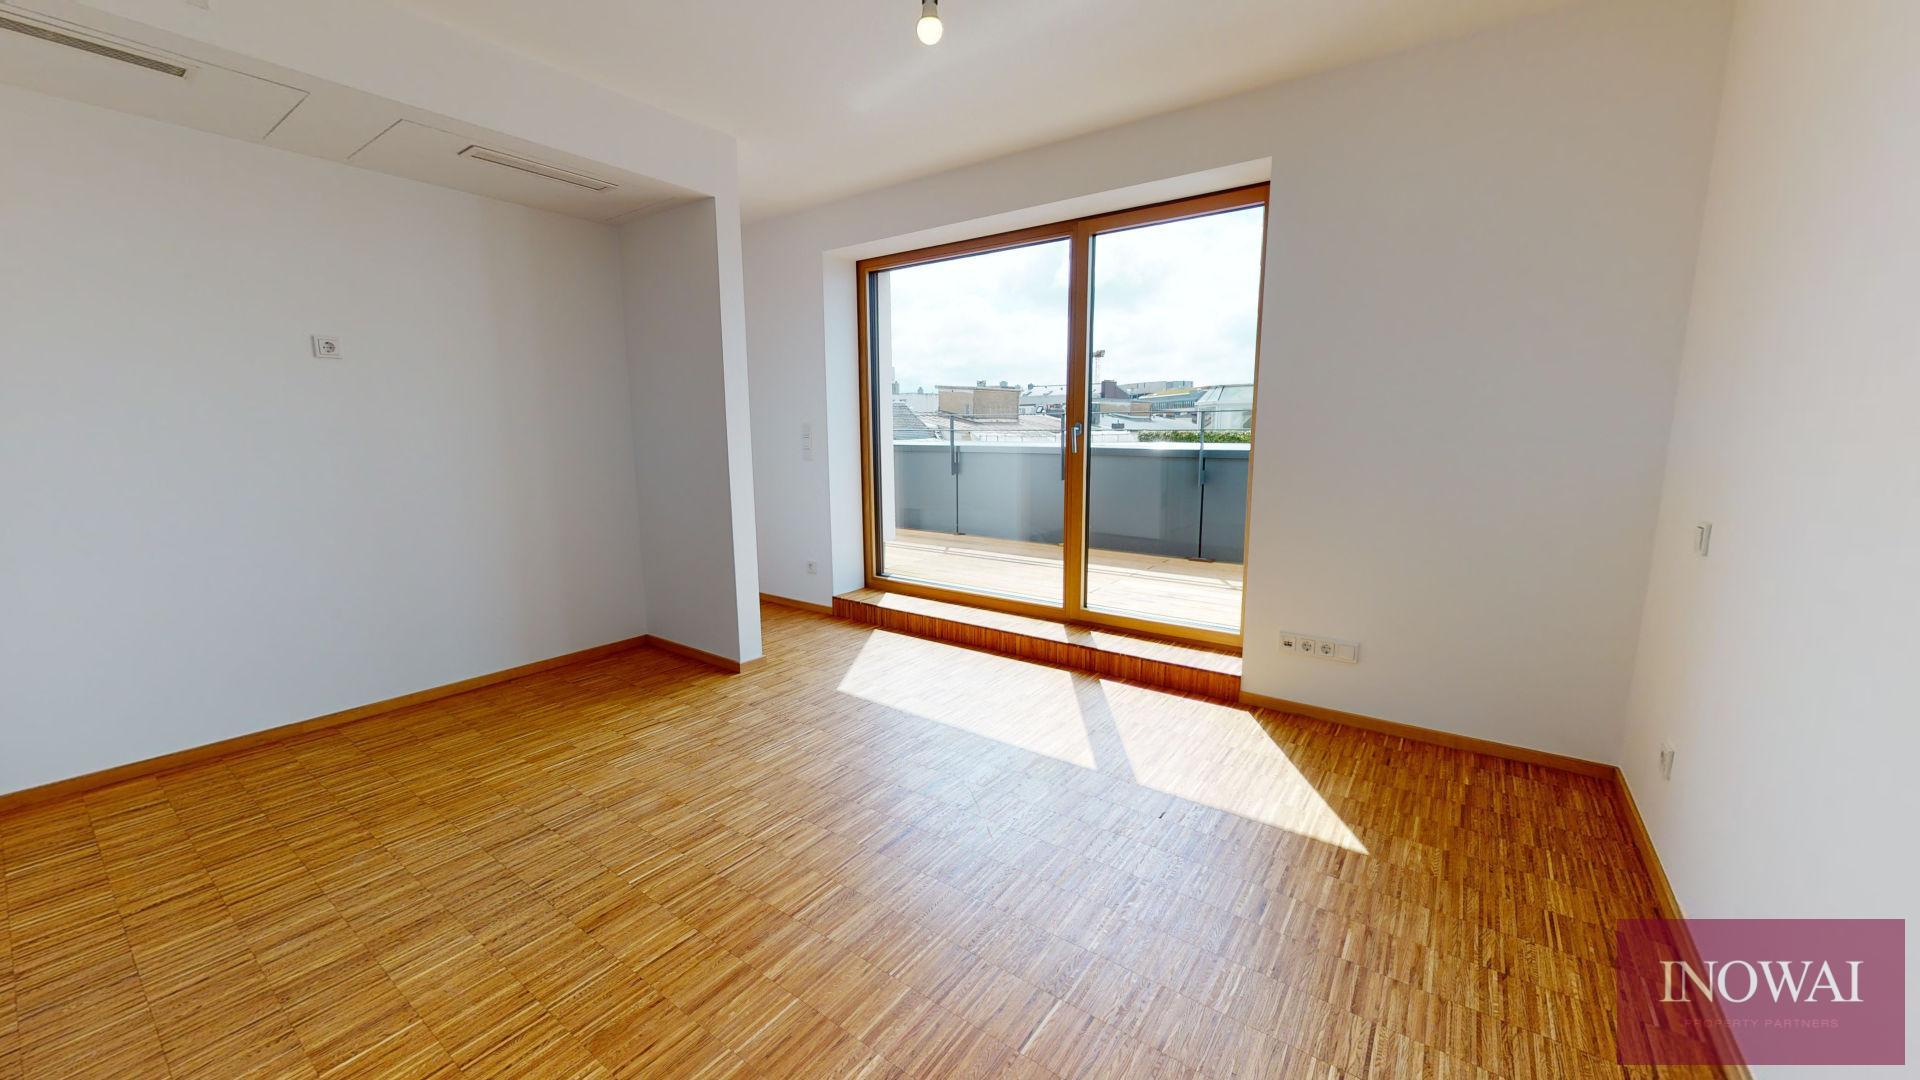 Appartement 1 chambre à louer à Luxembourg-Gare